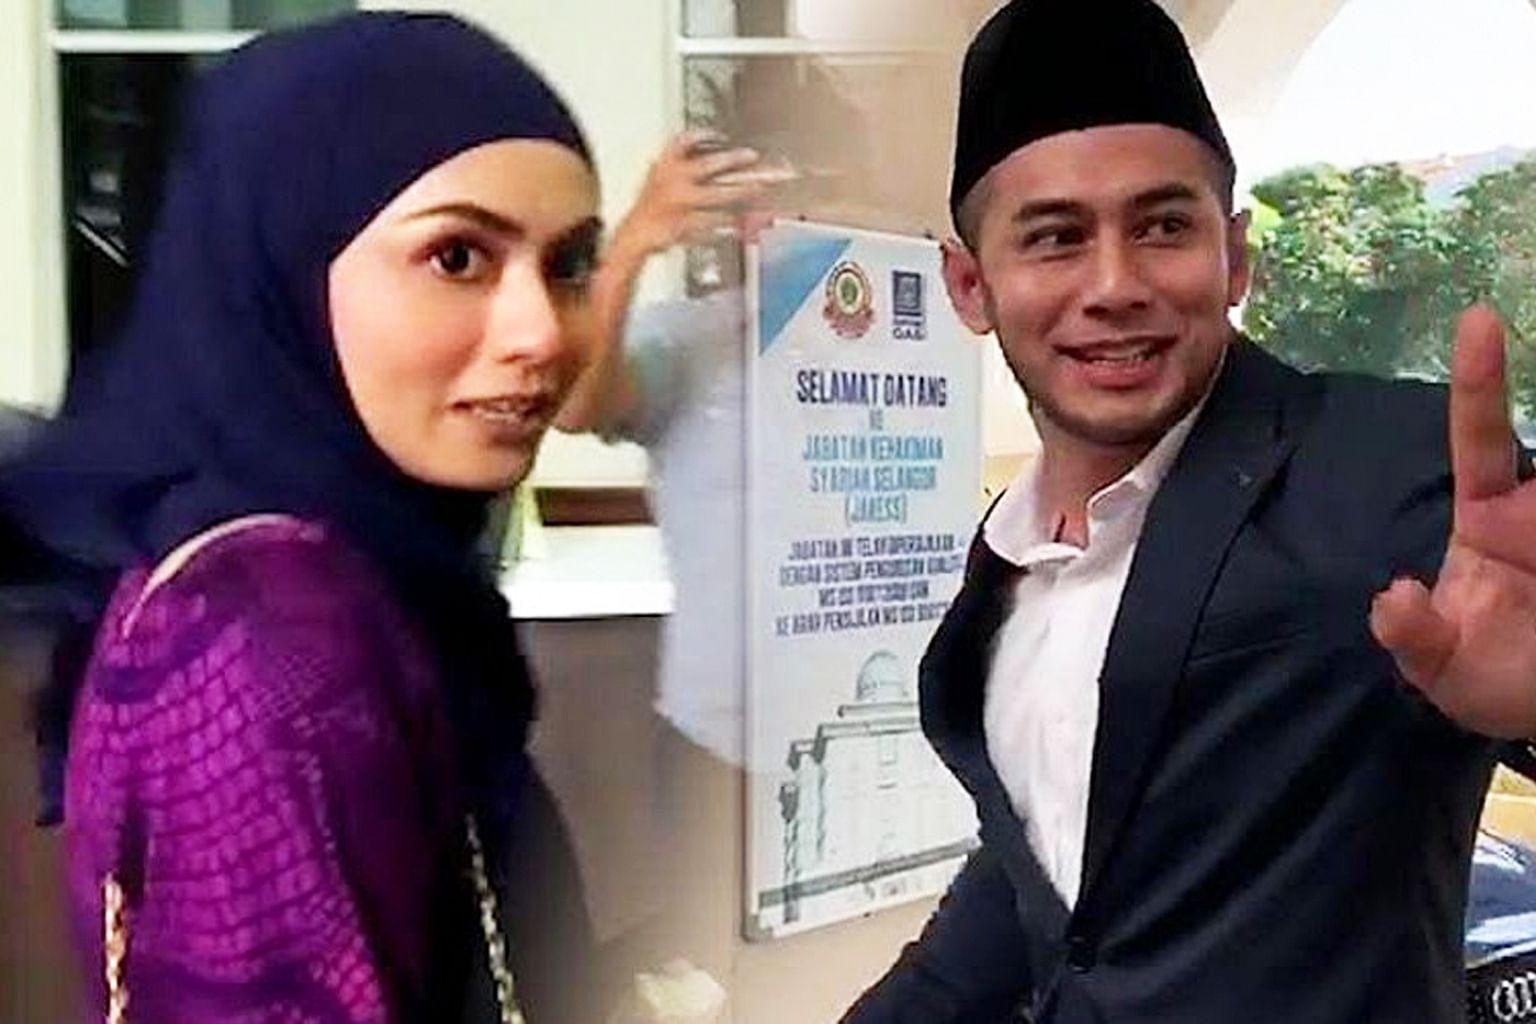 Mahligai selebriti Malaysia Fizo Omar, Mawar Karim hancur BAHANG MEDIA SOSIAL